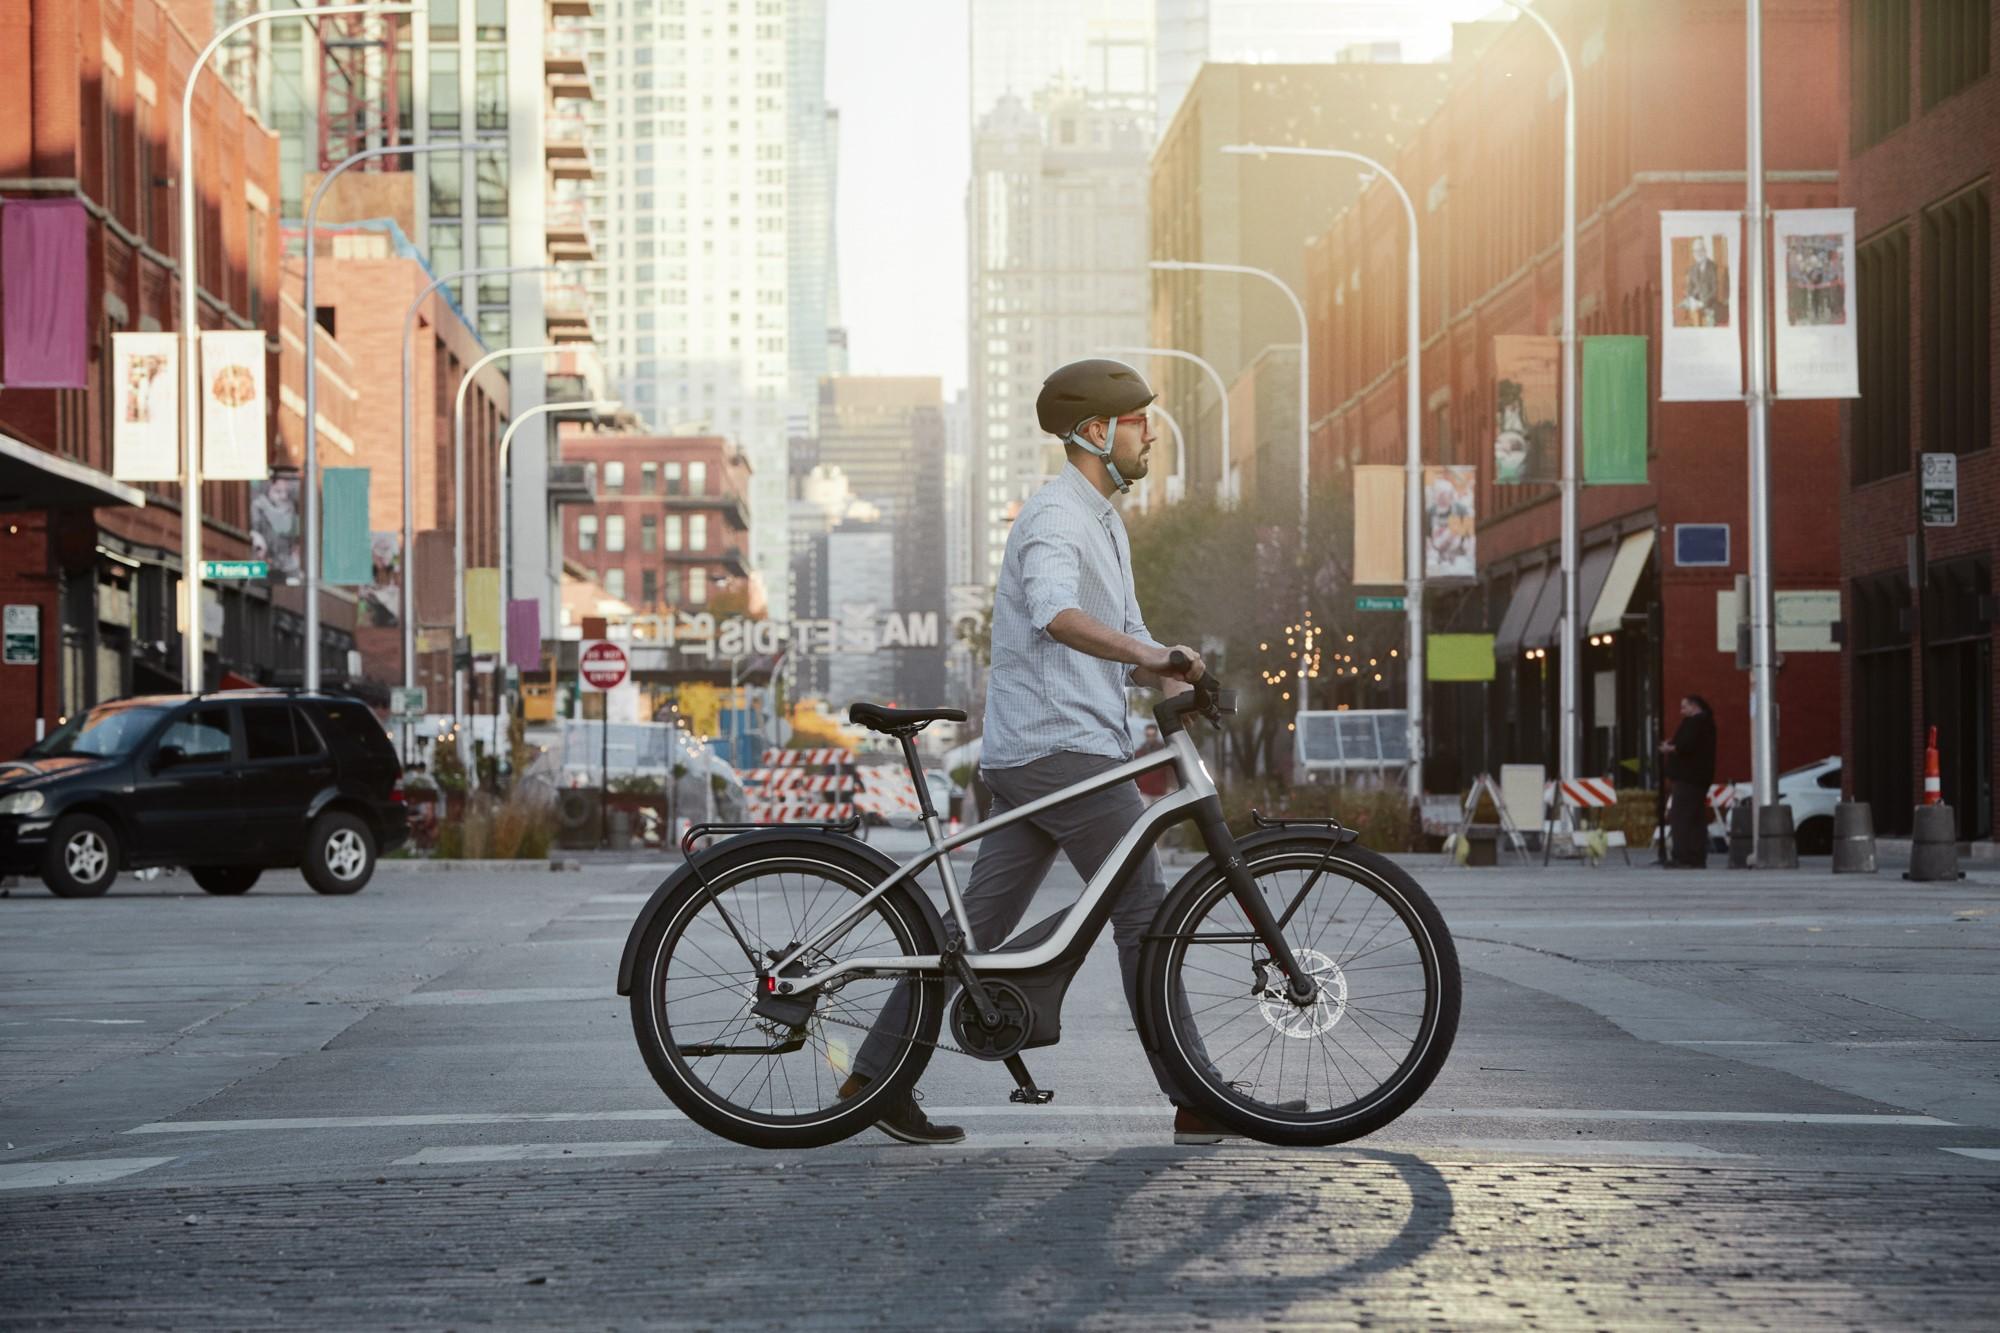 visual artificial intelligence analyzing city street